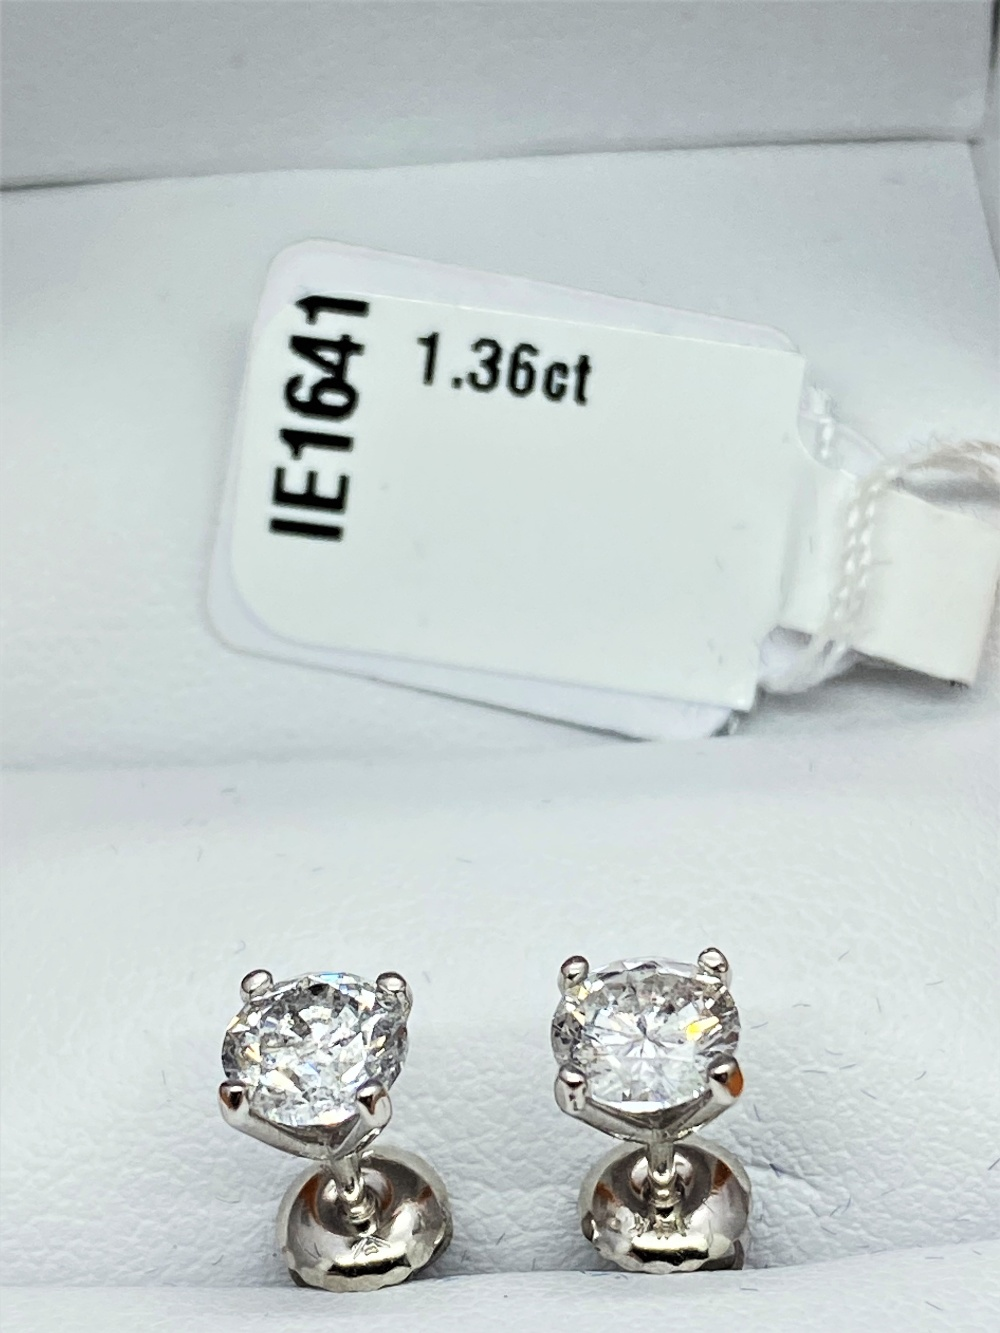 Pair of New 1.36 Carat Round Cut VS1/D Diamond Stud Earrings On 14K Hallmarked White Gold - Image 7 of 8